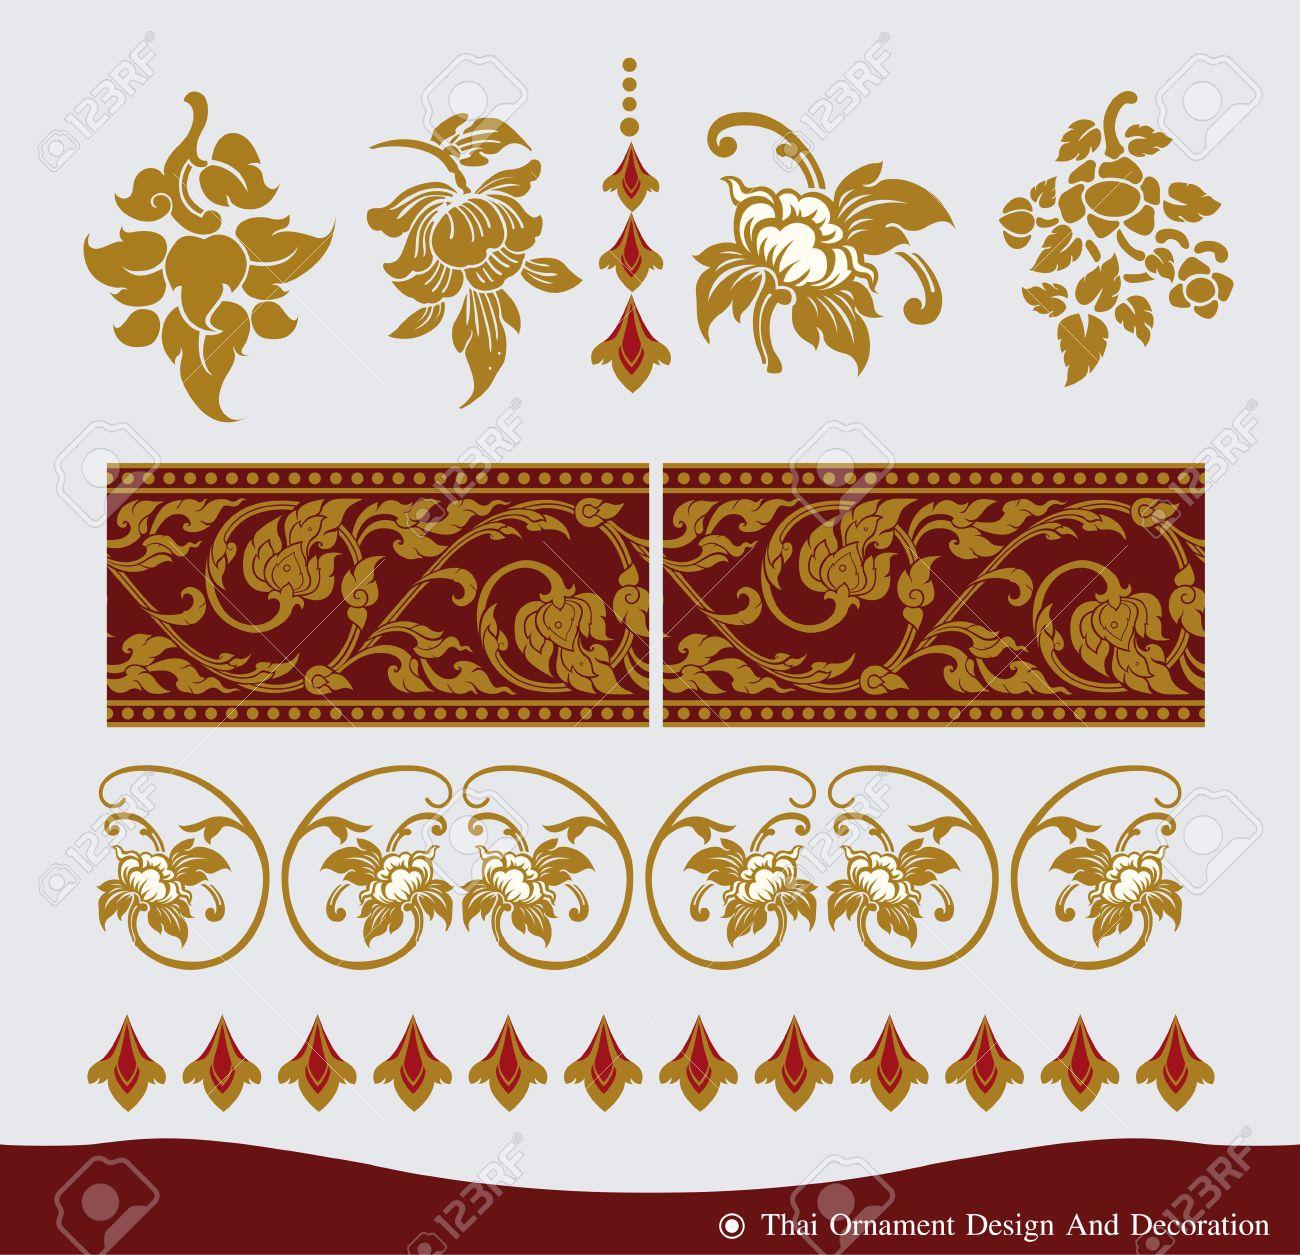 vector of thai ornament vintage frame designthai culture decorative border template design17 design